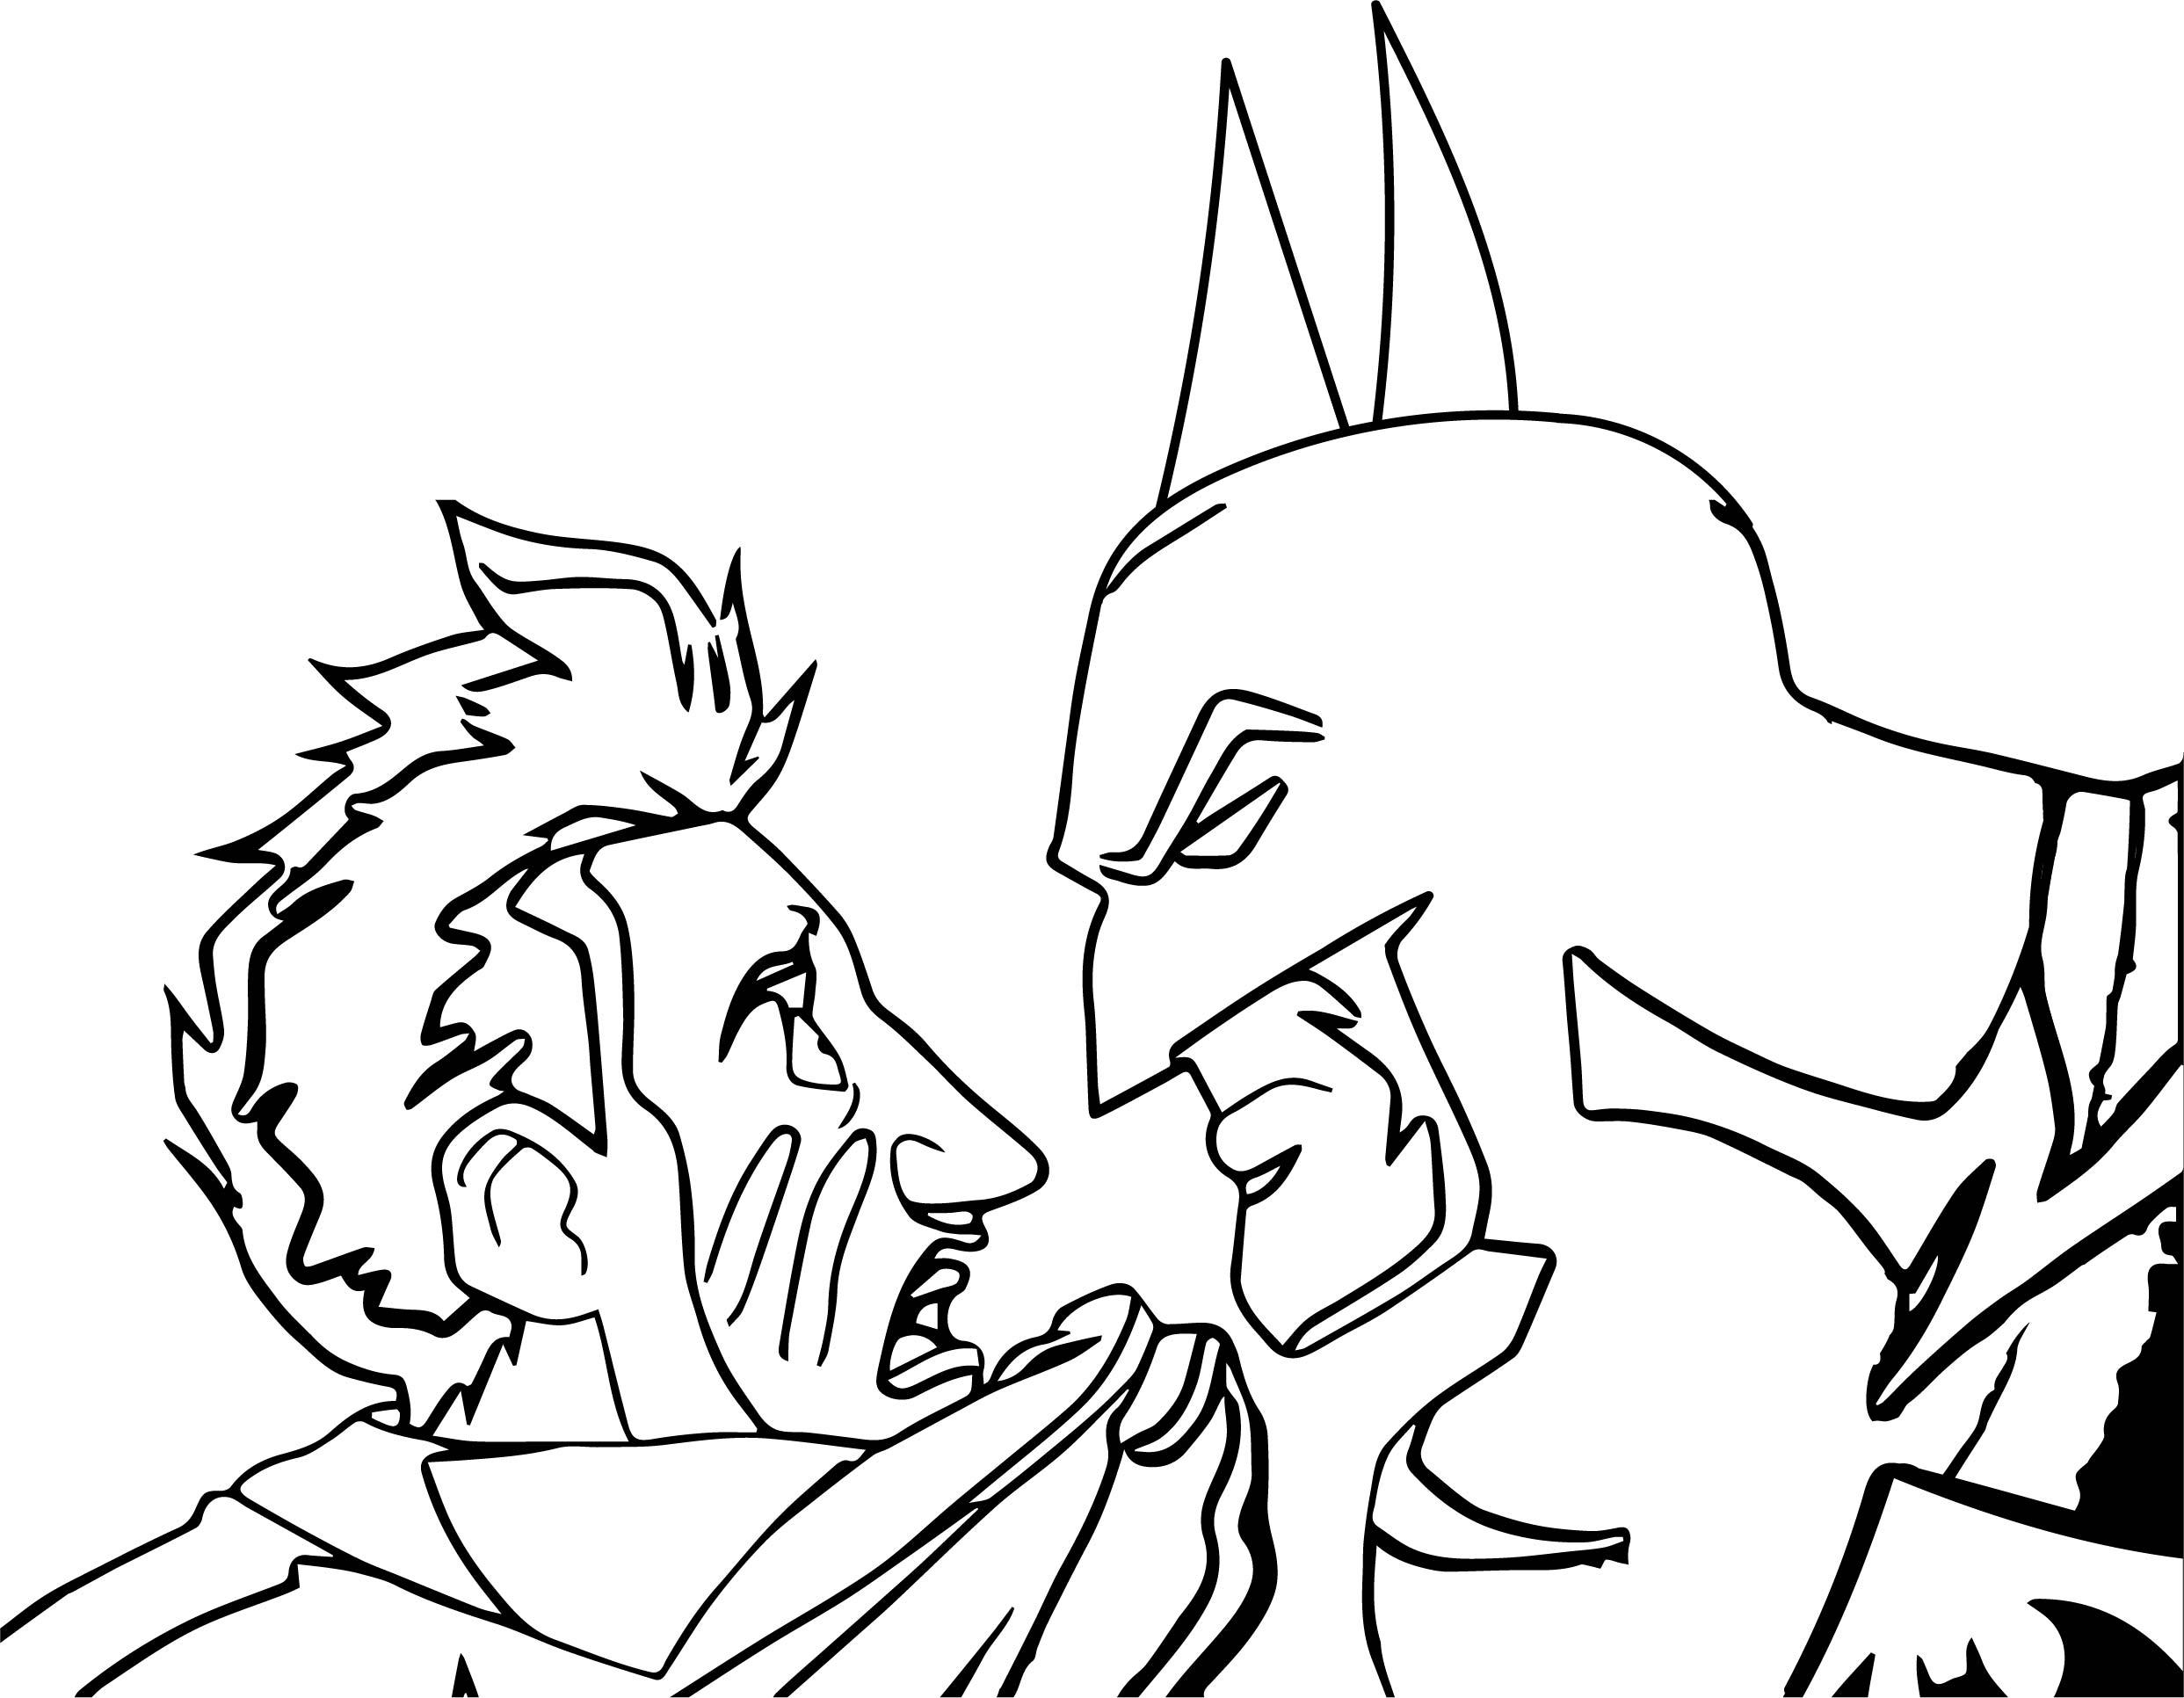 The Batman Joker Man Coloring Page | Wecoloringpage